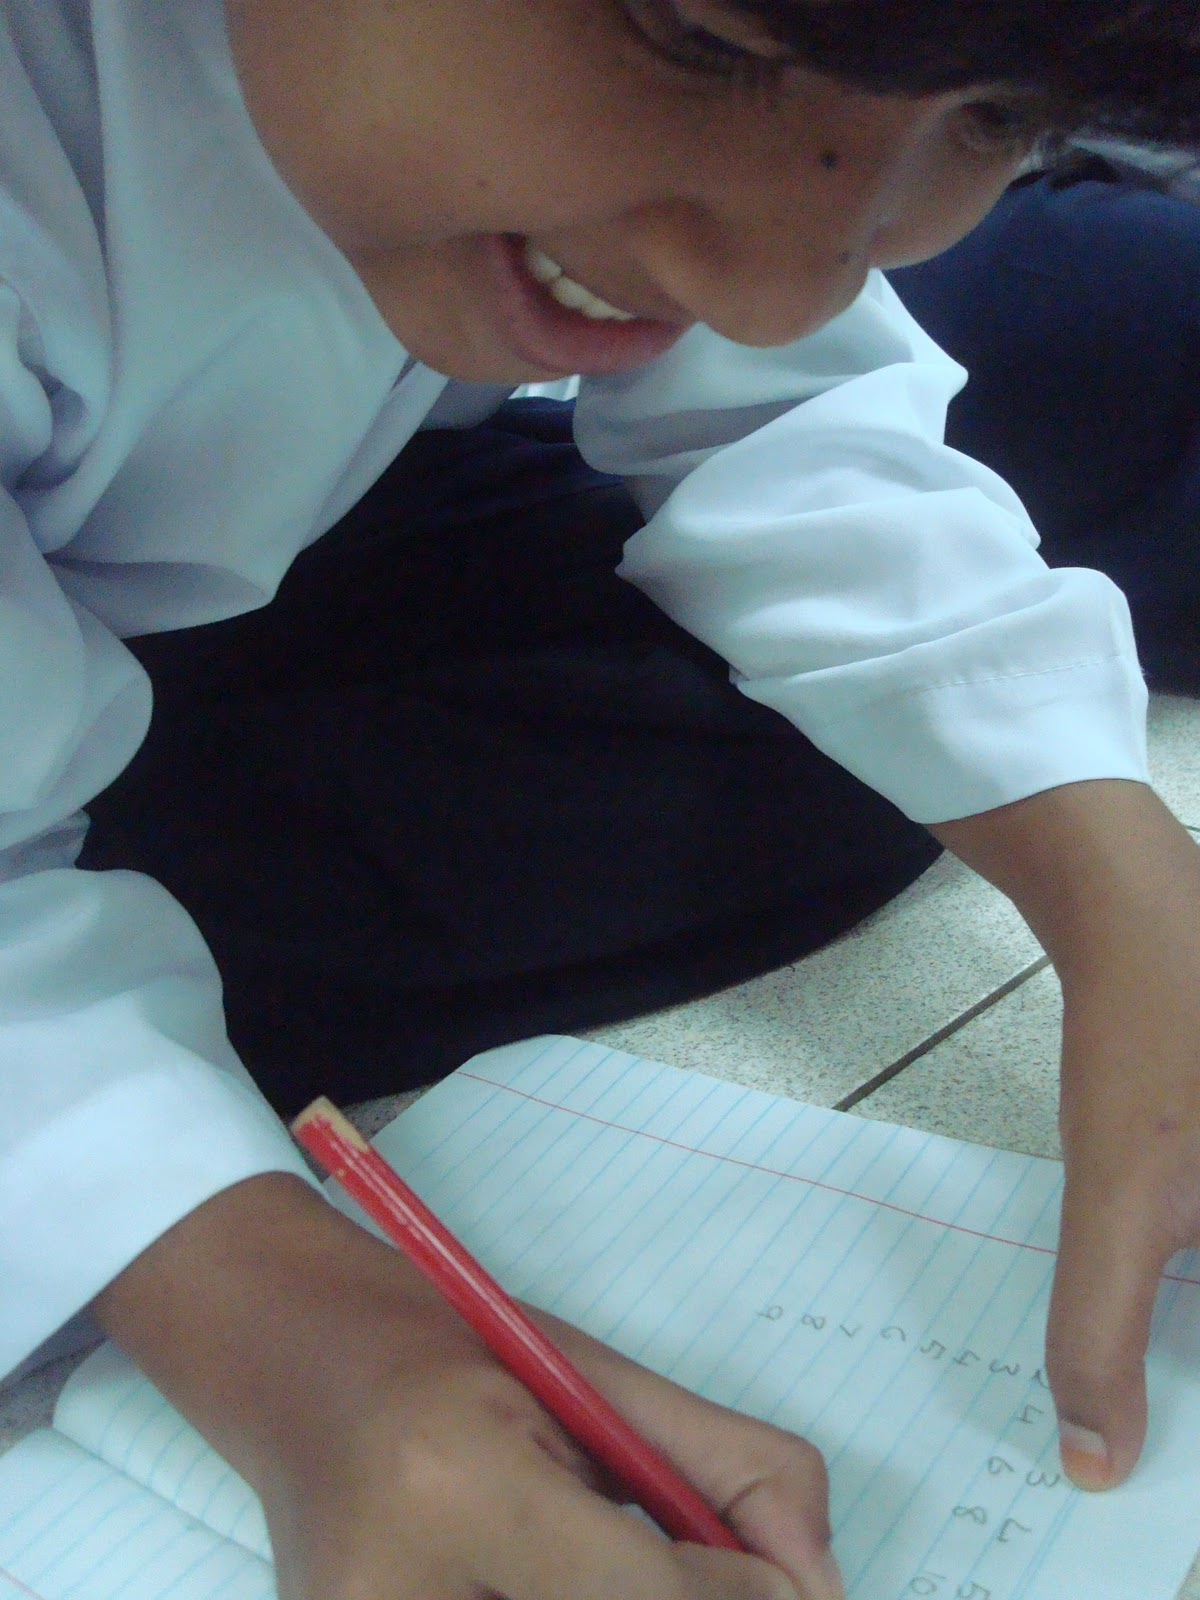 Atar 99 95 scholarship essay